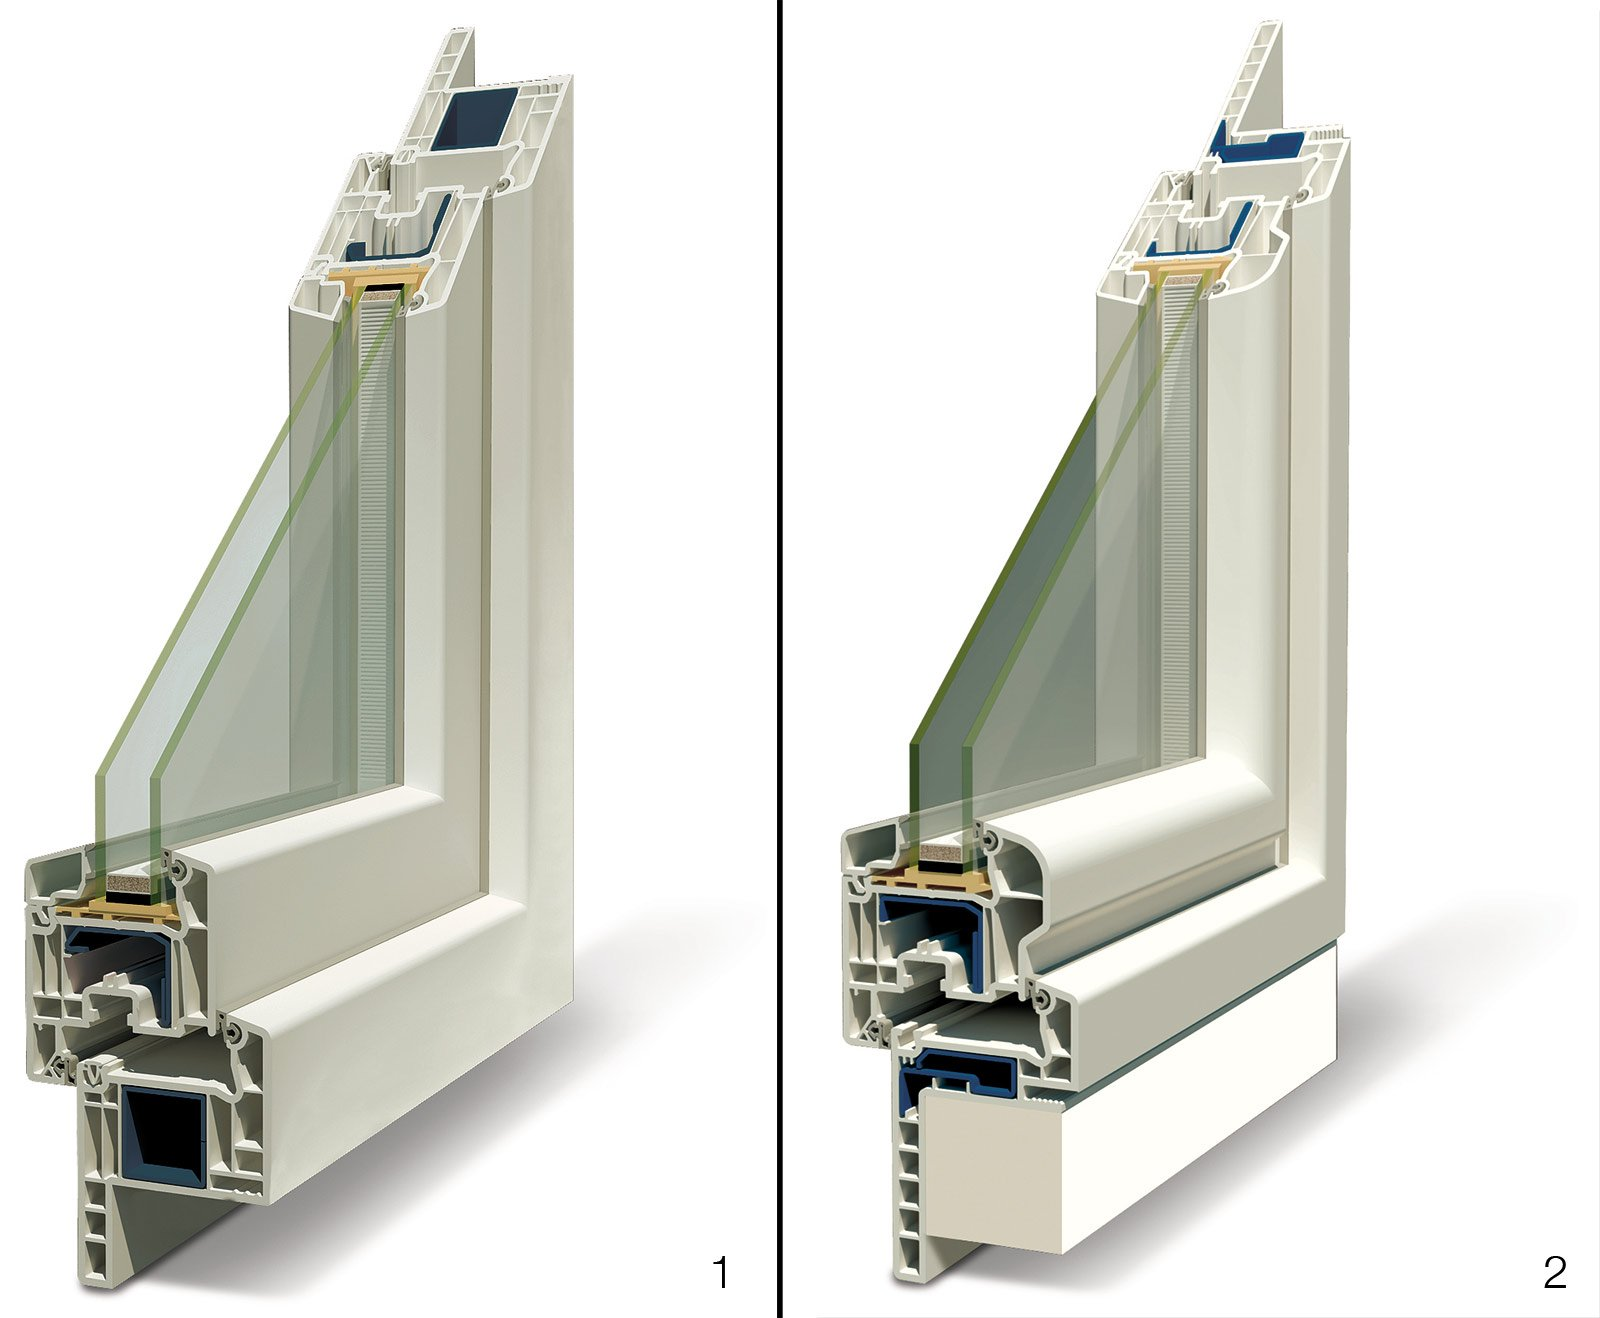 Oknoplast prolux prezzi fabulous finestra in pvc bianco vista interna porta finestre oknoplast - Quanto costa una finestra in pvc ...